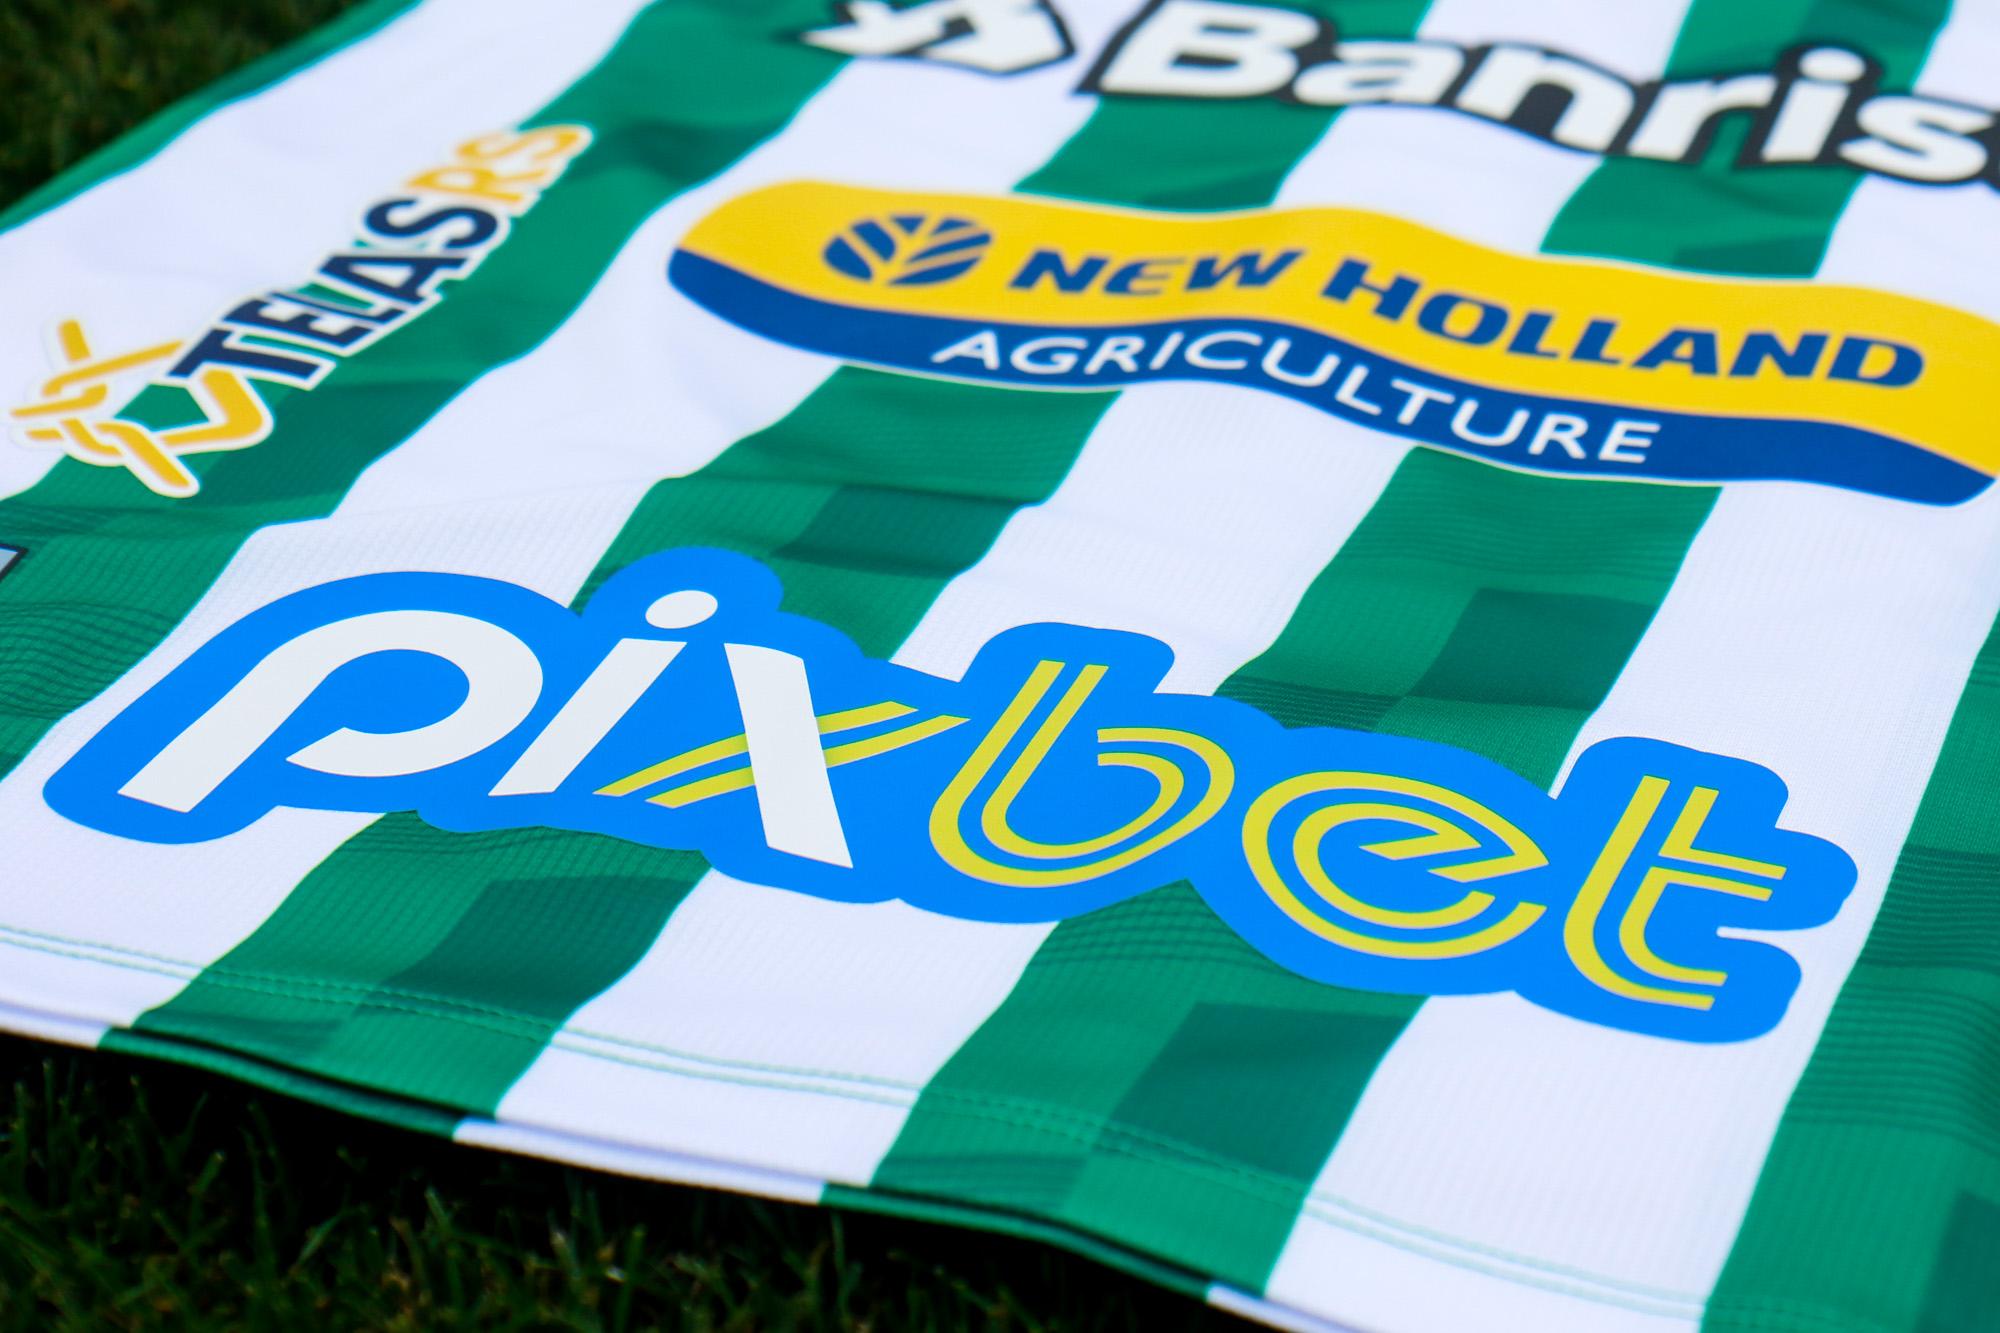 Juventude e Pixbet estendem contrato de patrocínio até o final da temporada